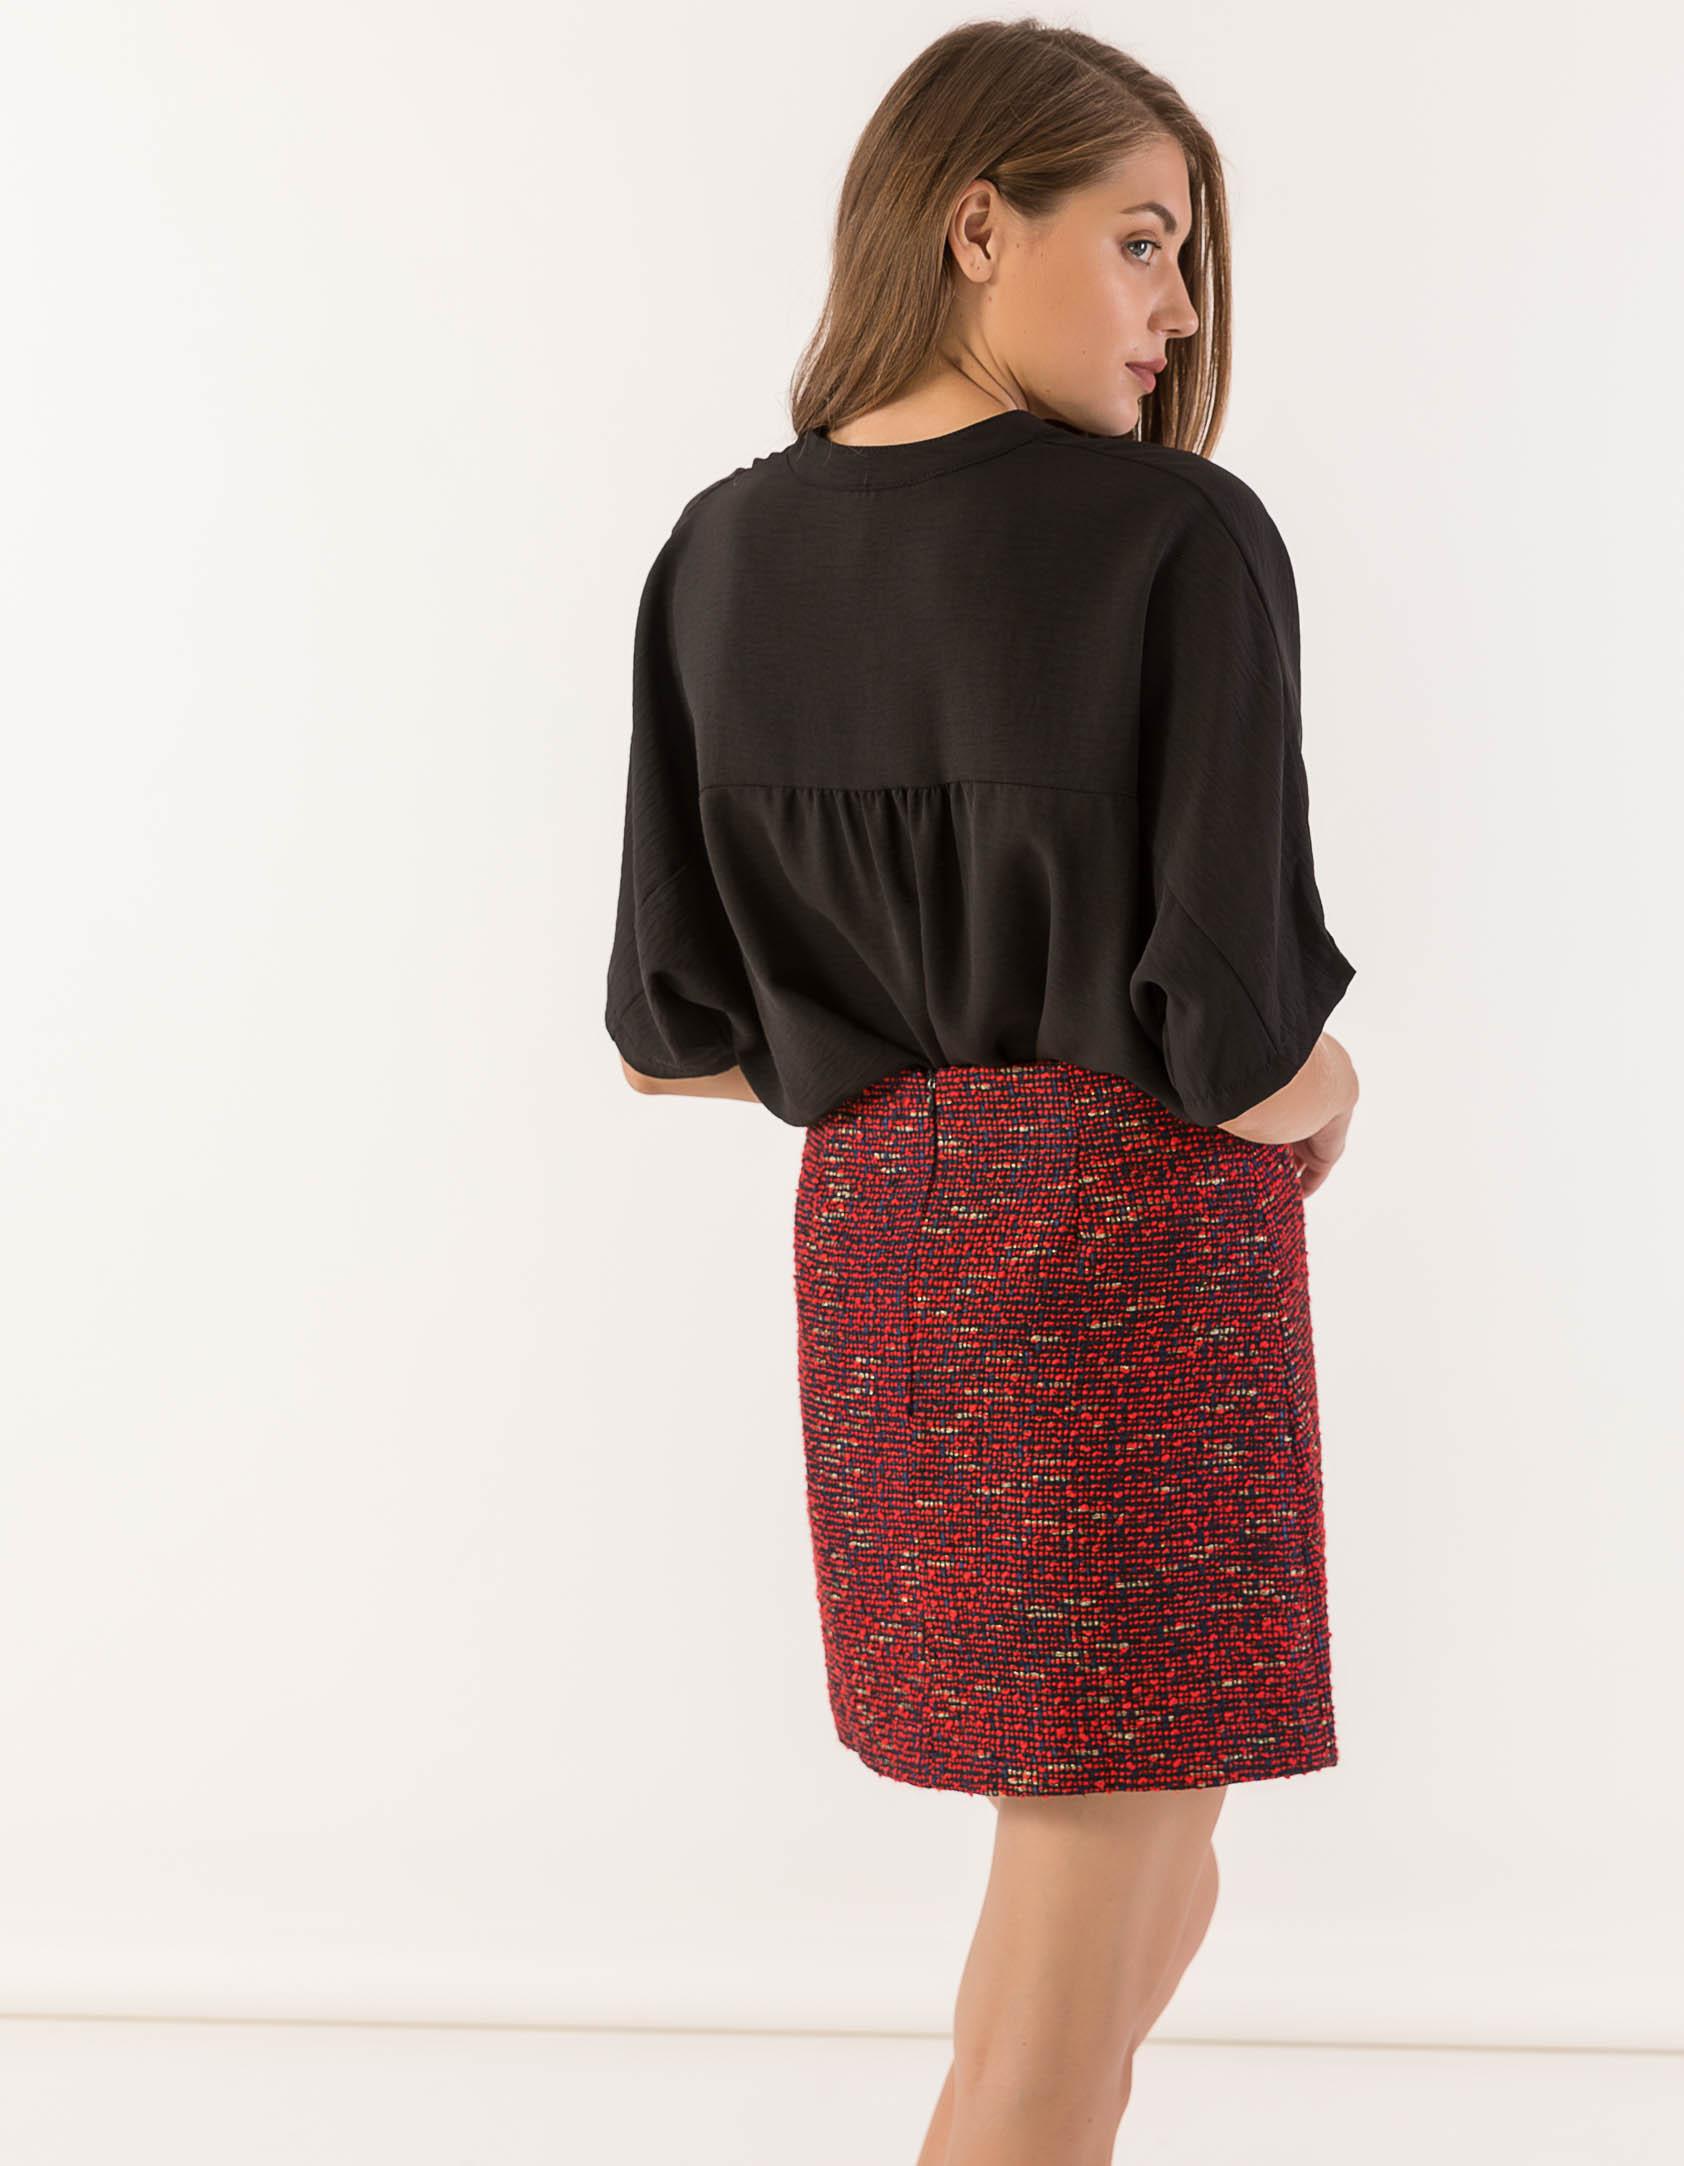 7ef13567603 Φούστα mini σε Α γραμμή από μπουκλέ ύφασμα - Issue